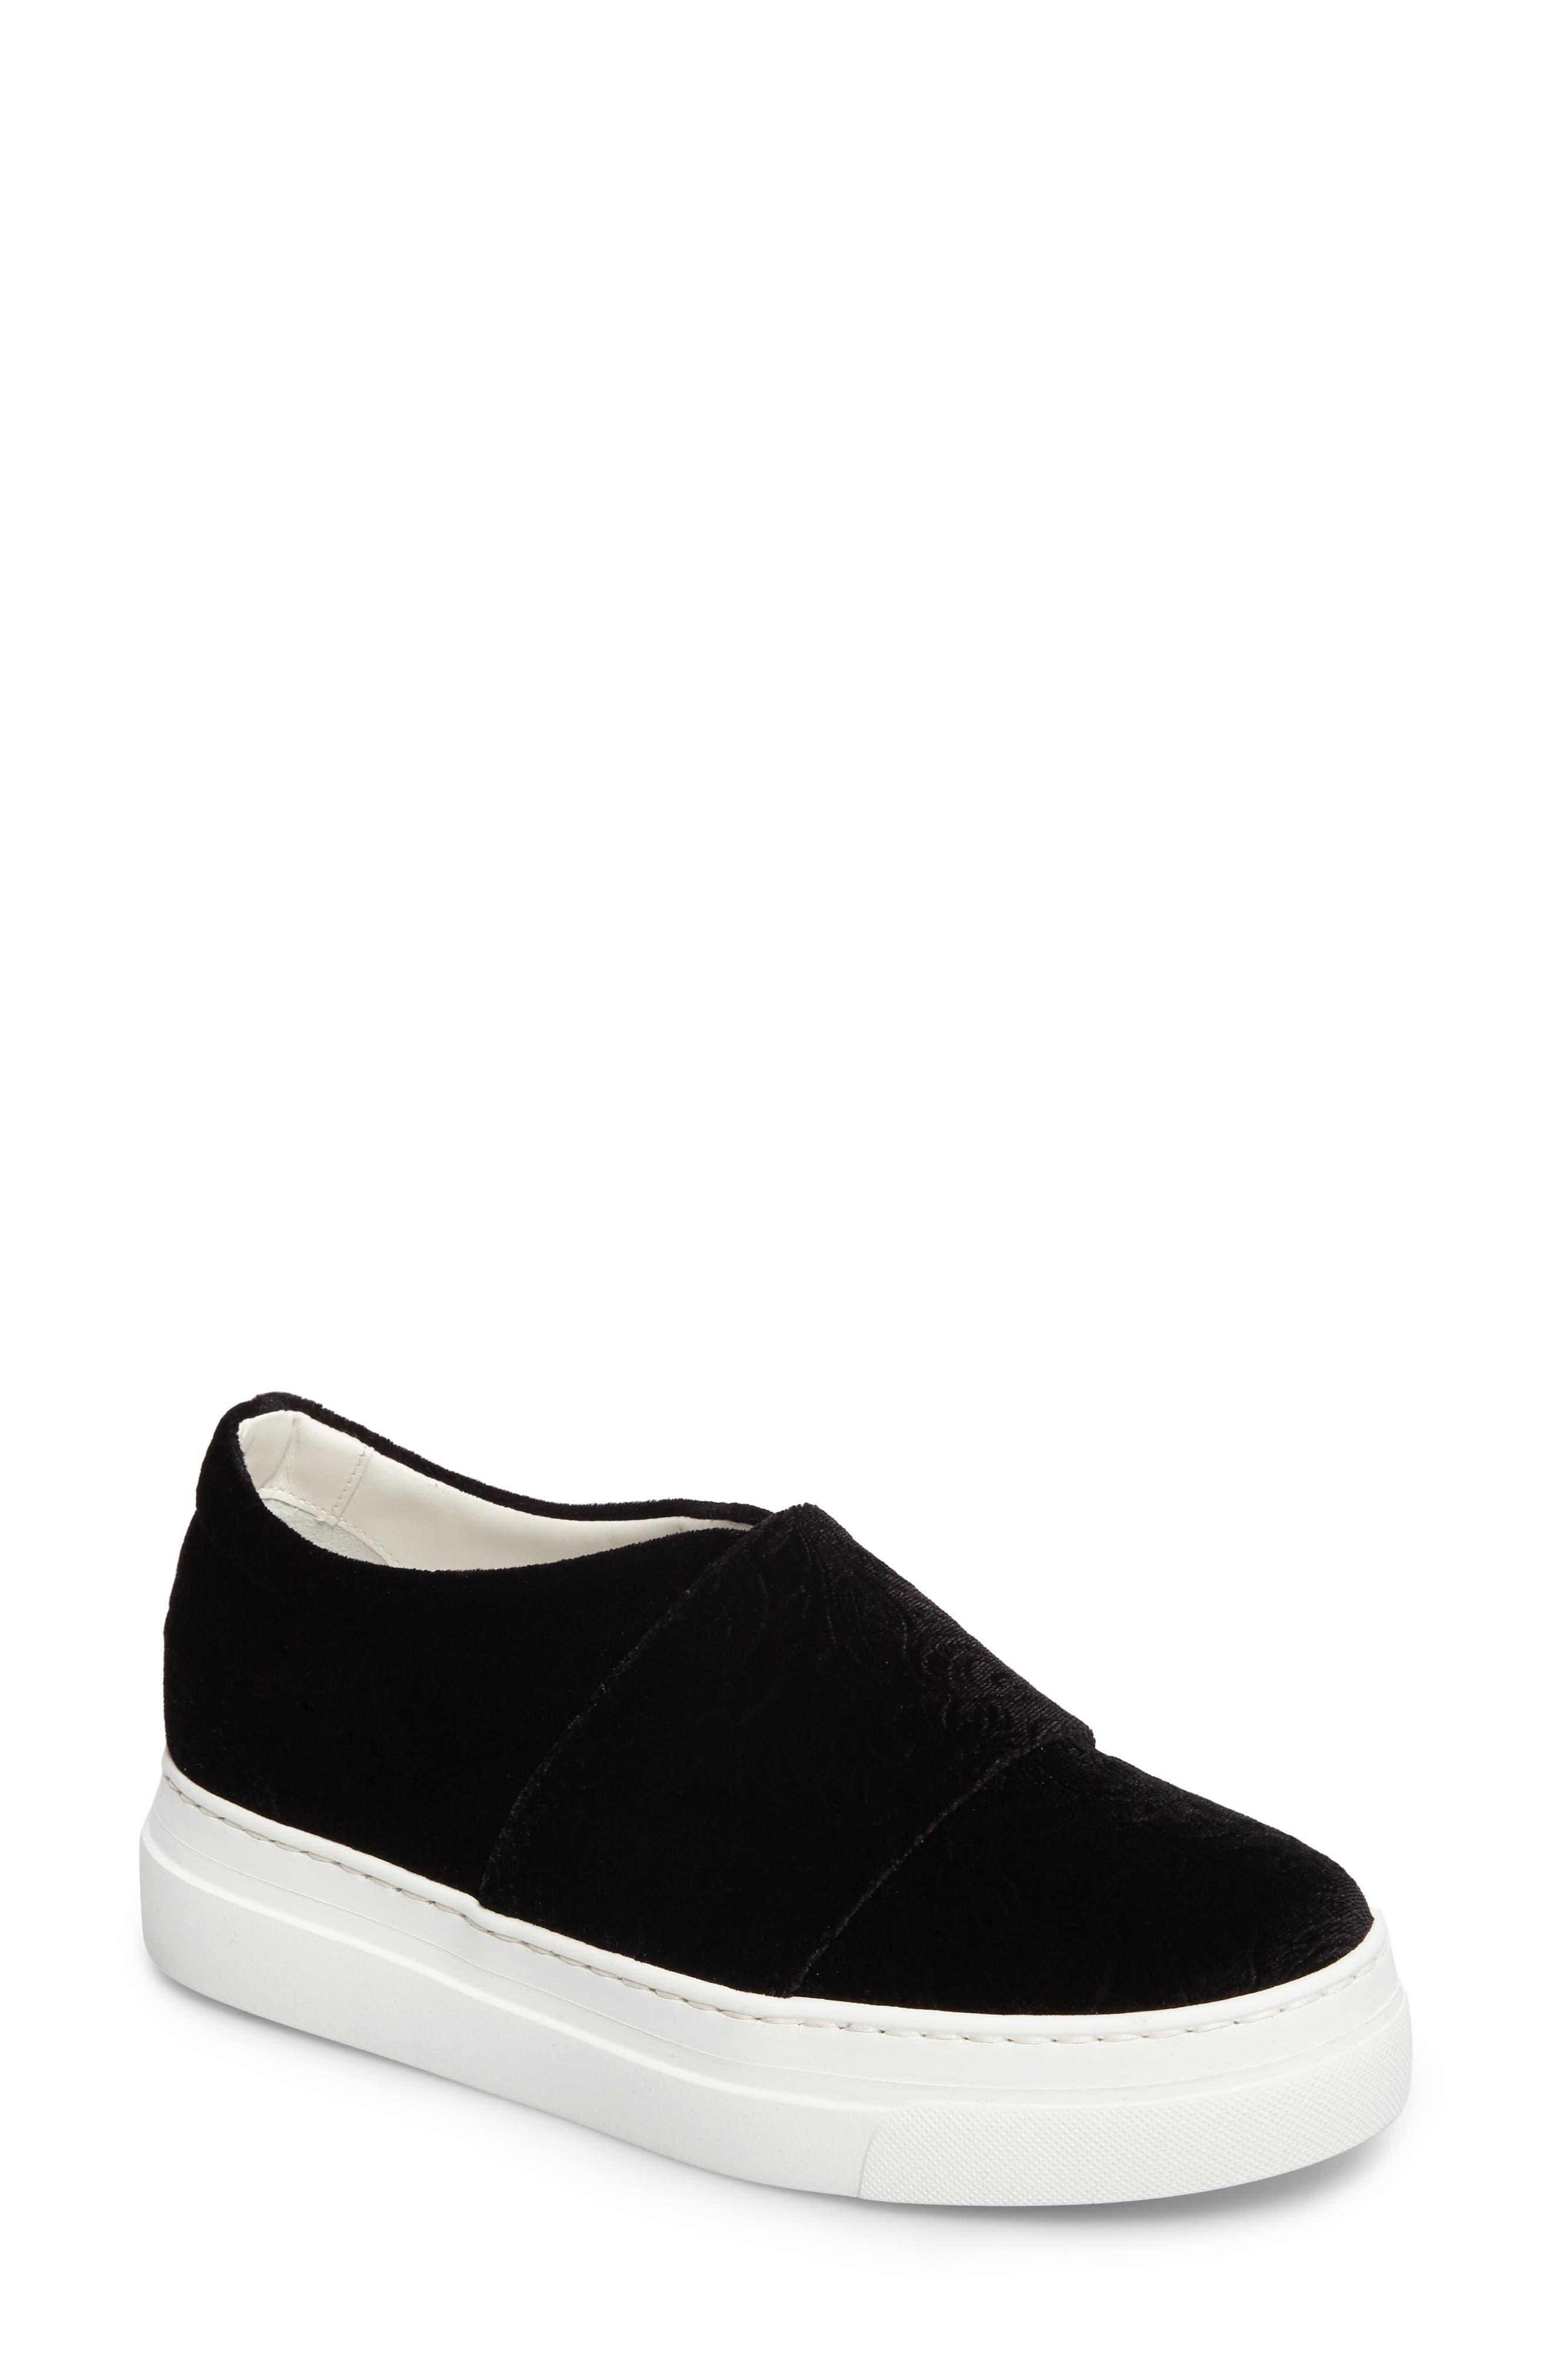 Arlo Slip-On Platform Sneaker,                         Main,                         color, 003